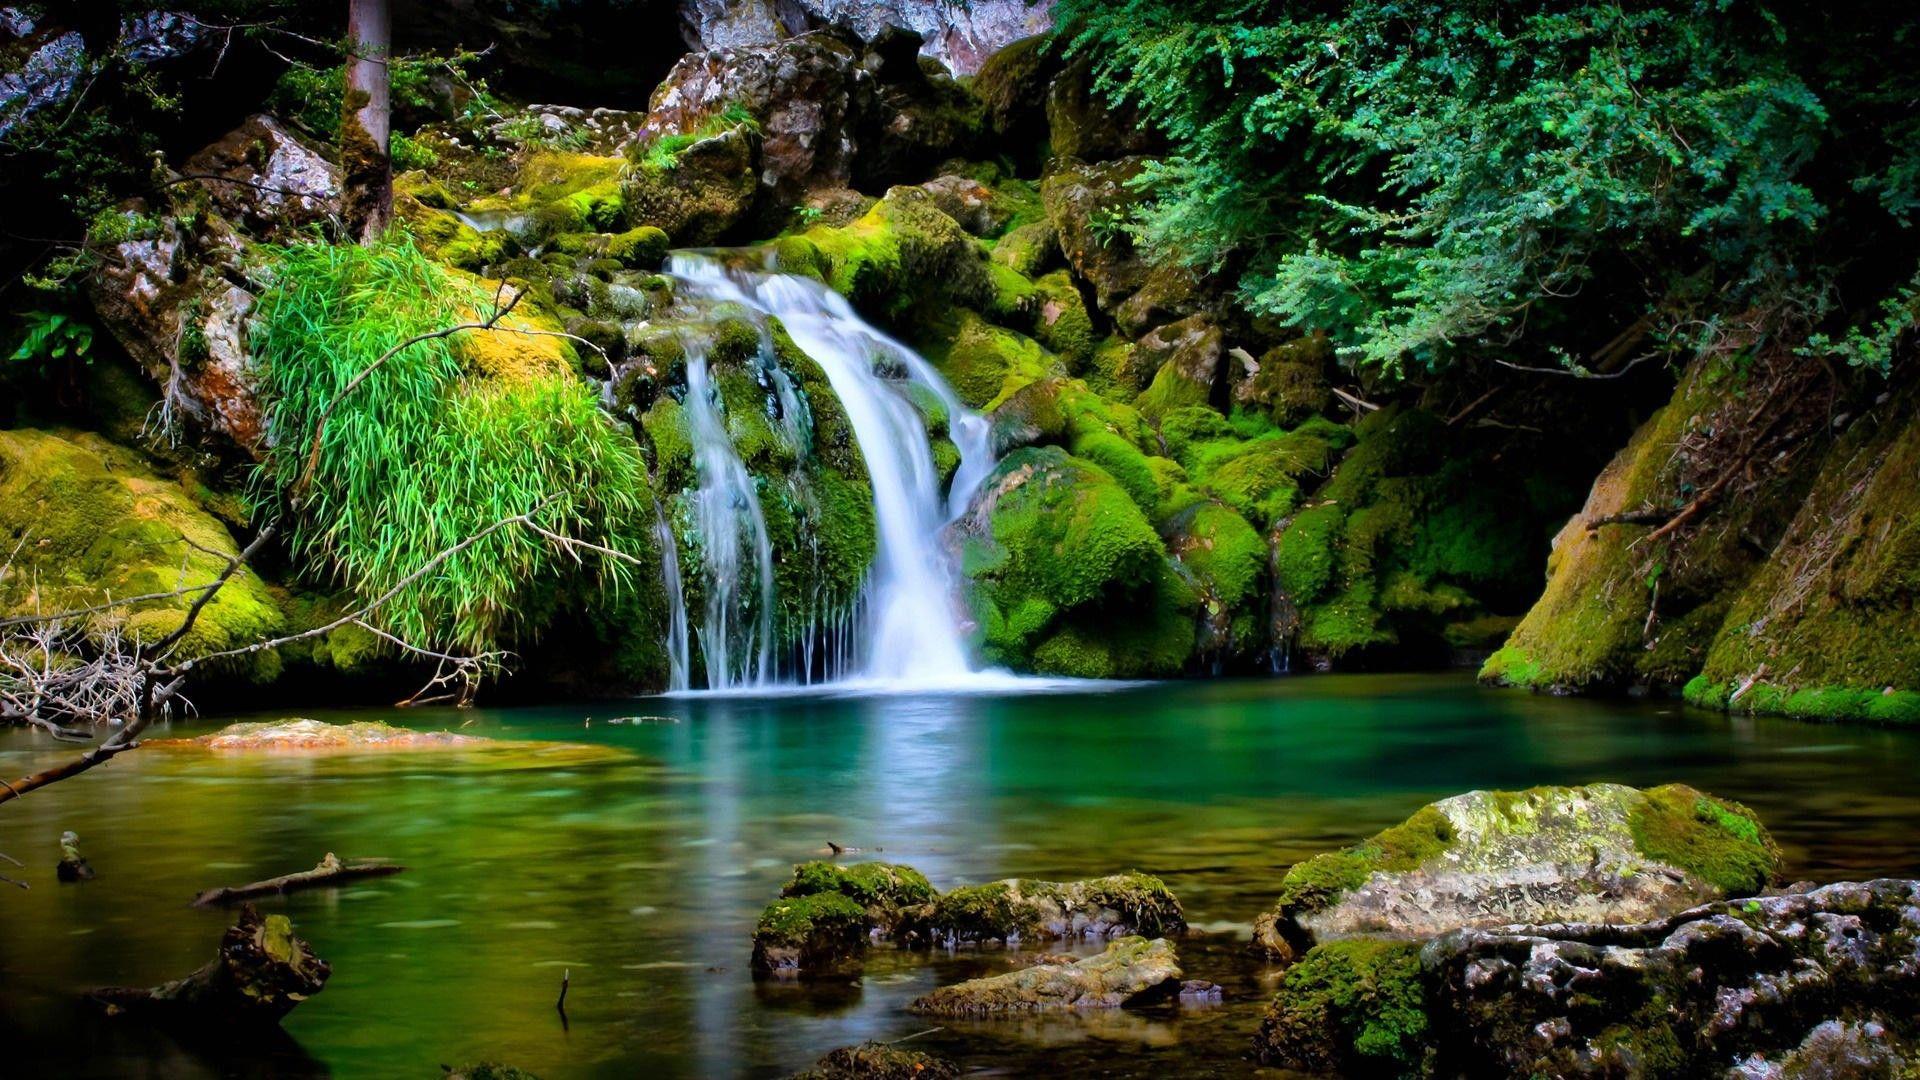 Free Desktop Wallpaper Google Search Waterfall Scenery Waterfall Wallpaper Waterfall Pictures